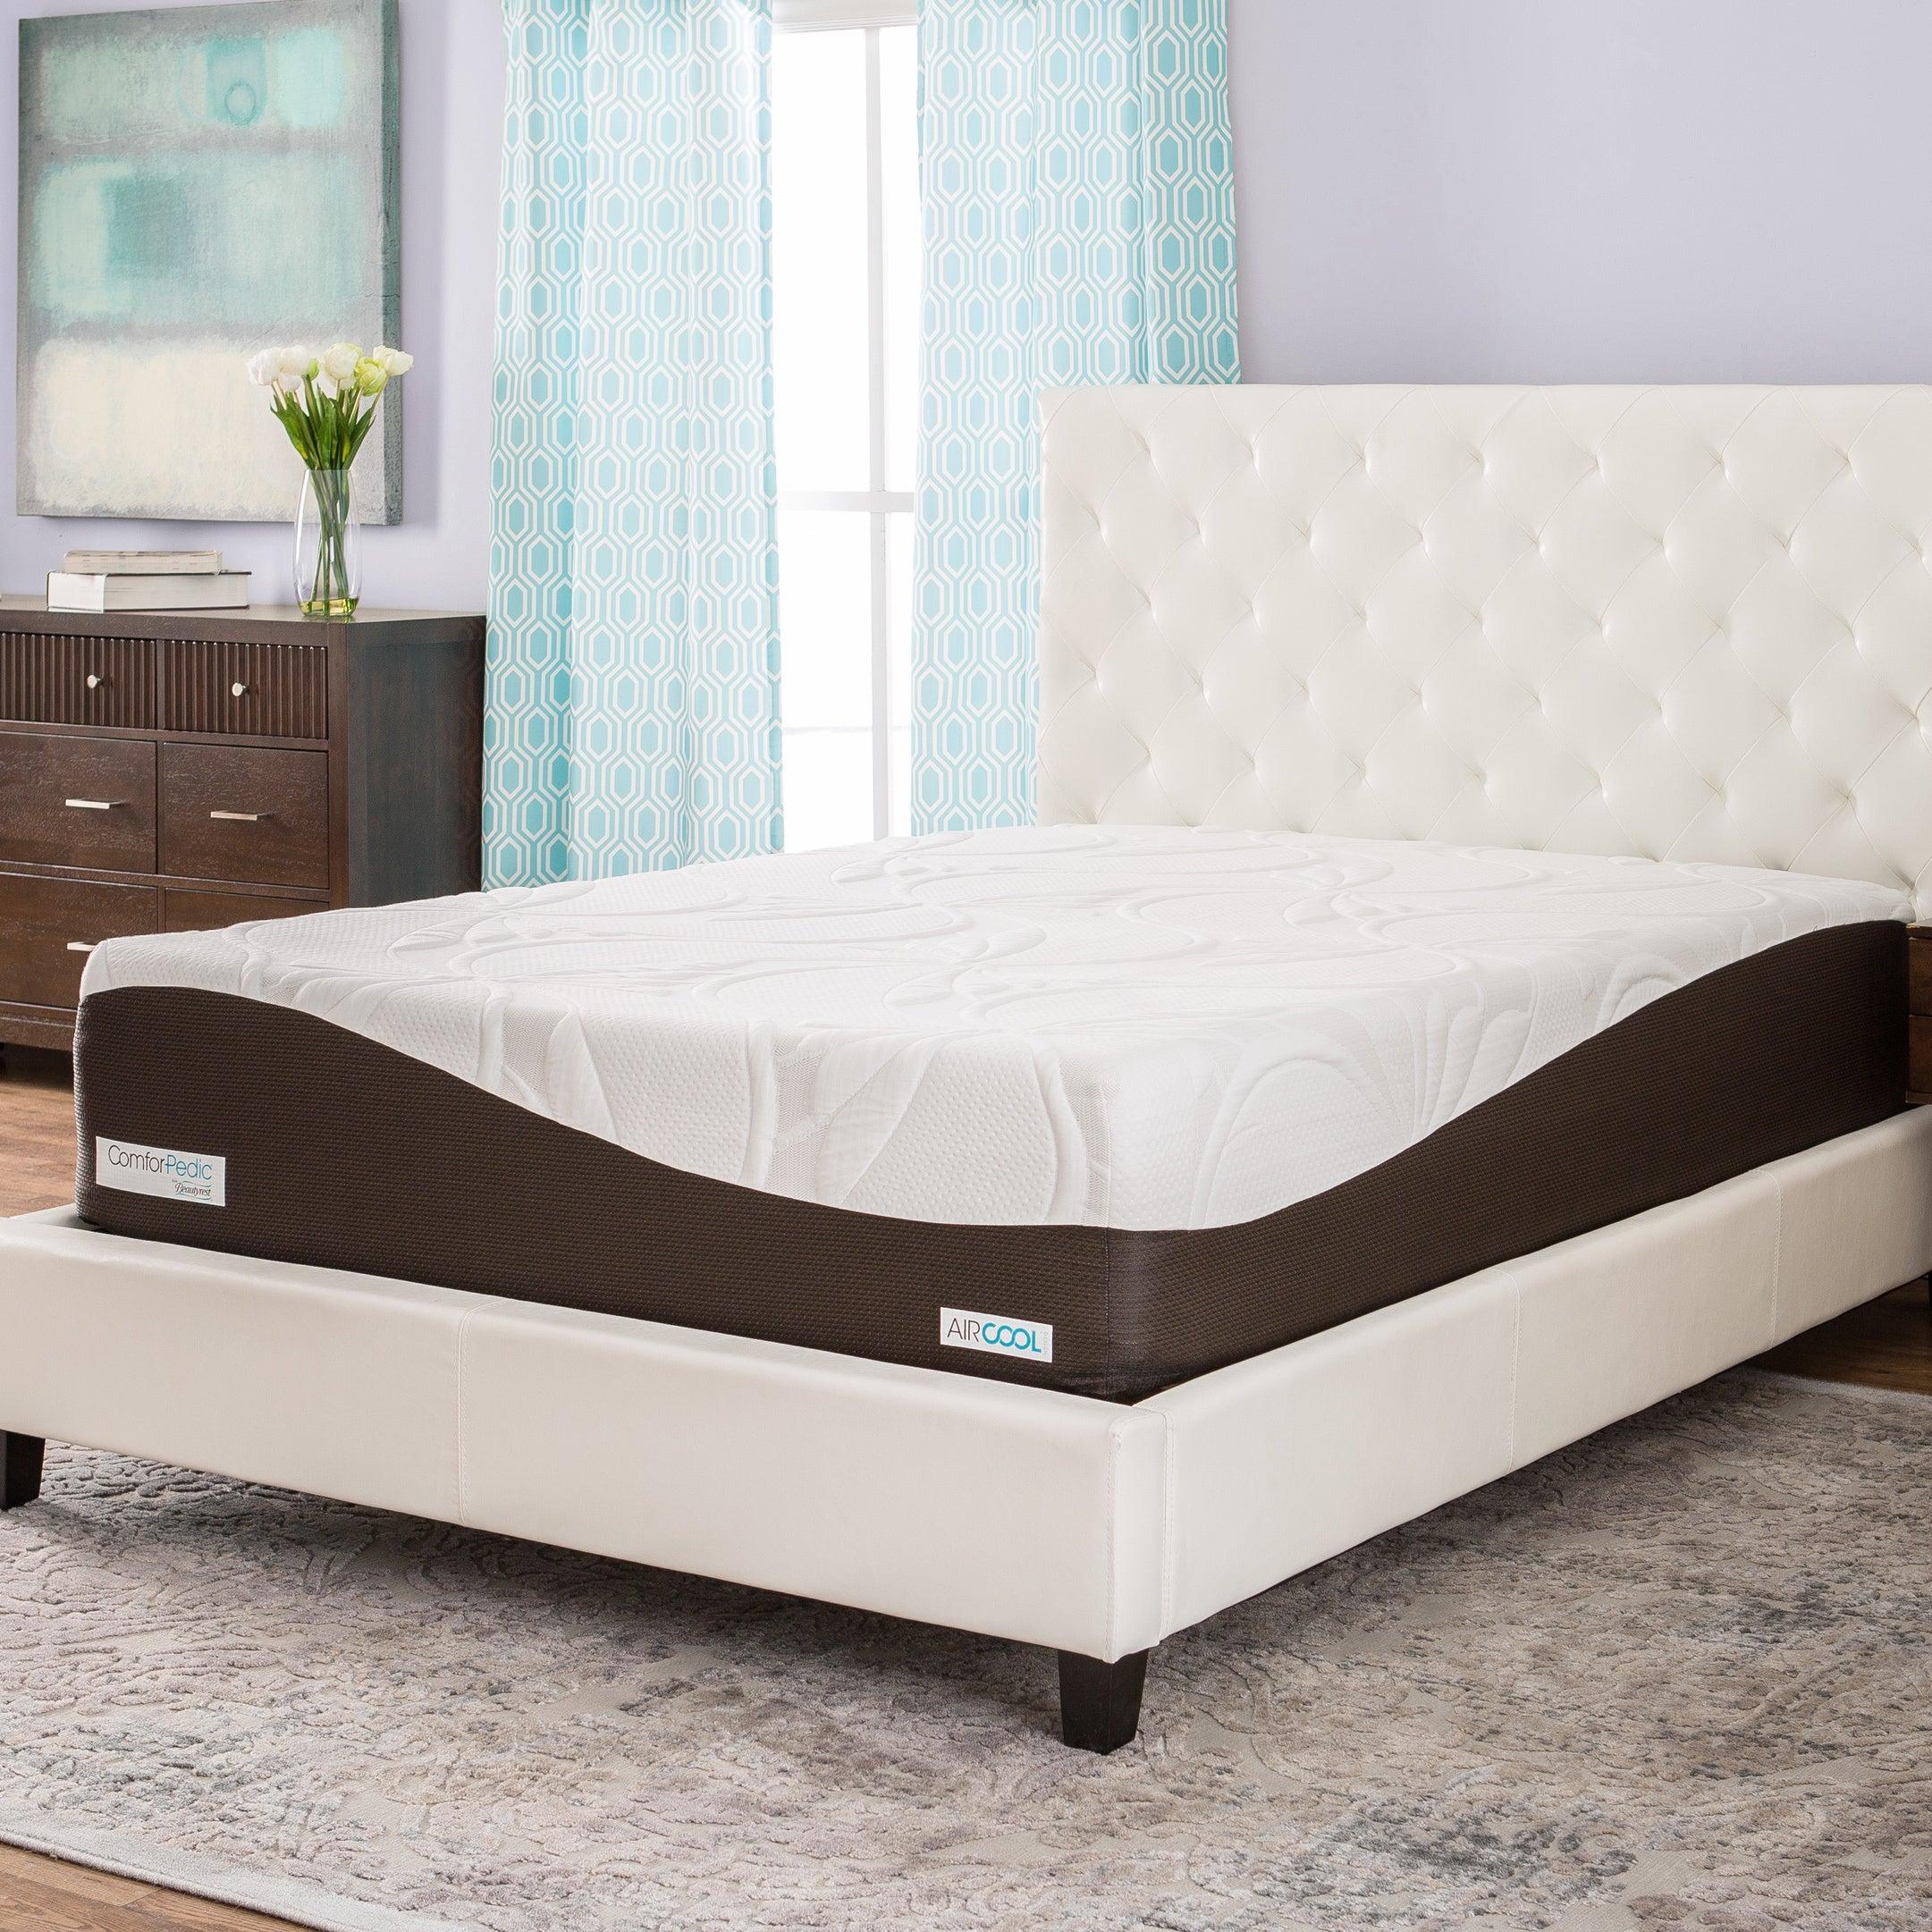 Shop Comforpedic From Beautyrest 14 Inch Memory Foam Mattress On